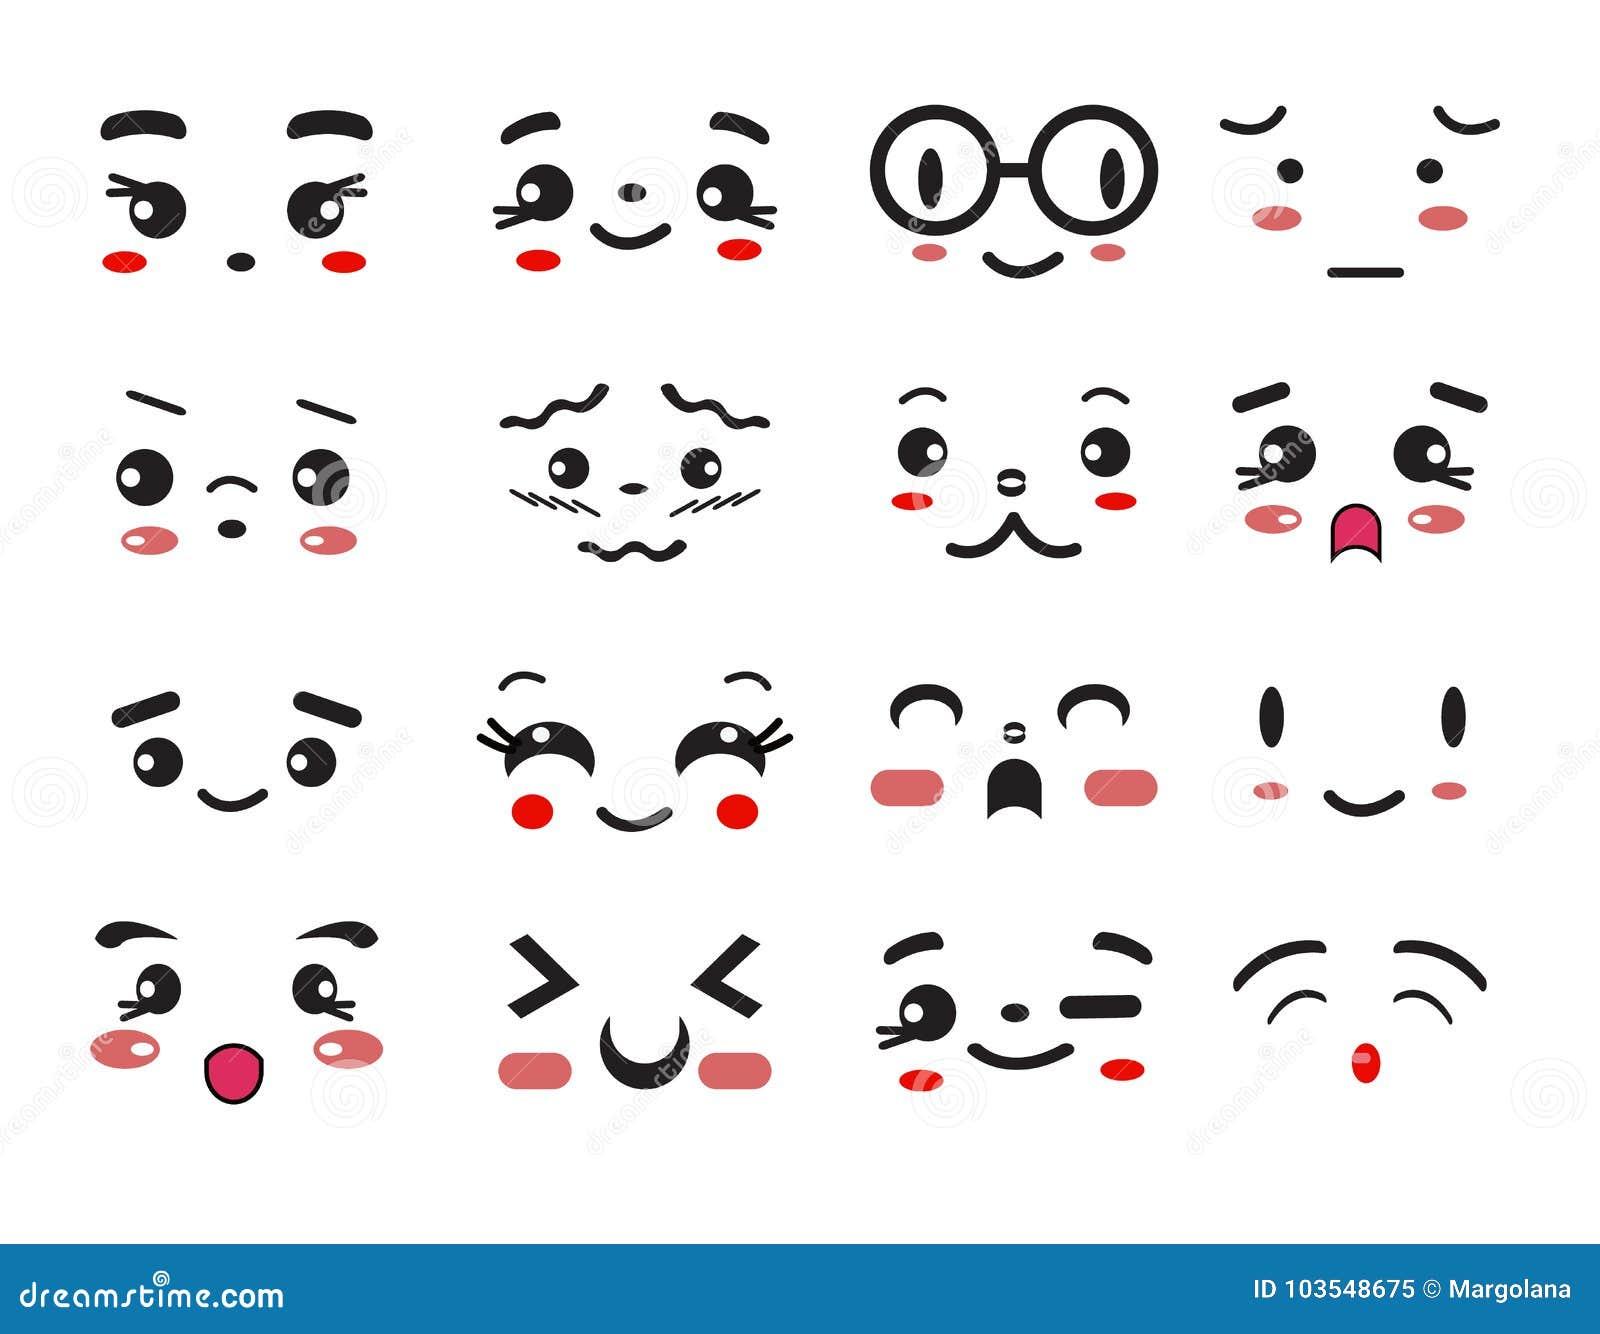 Kawaii cute smile emoticons and japanese anime emoji stock vector illustration of expressions - Emoticone kawaii ...